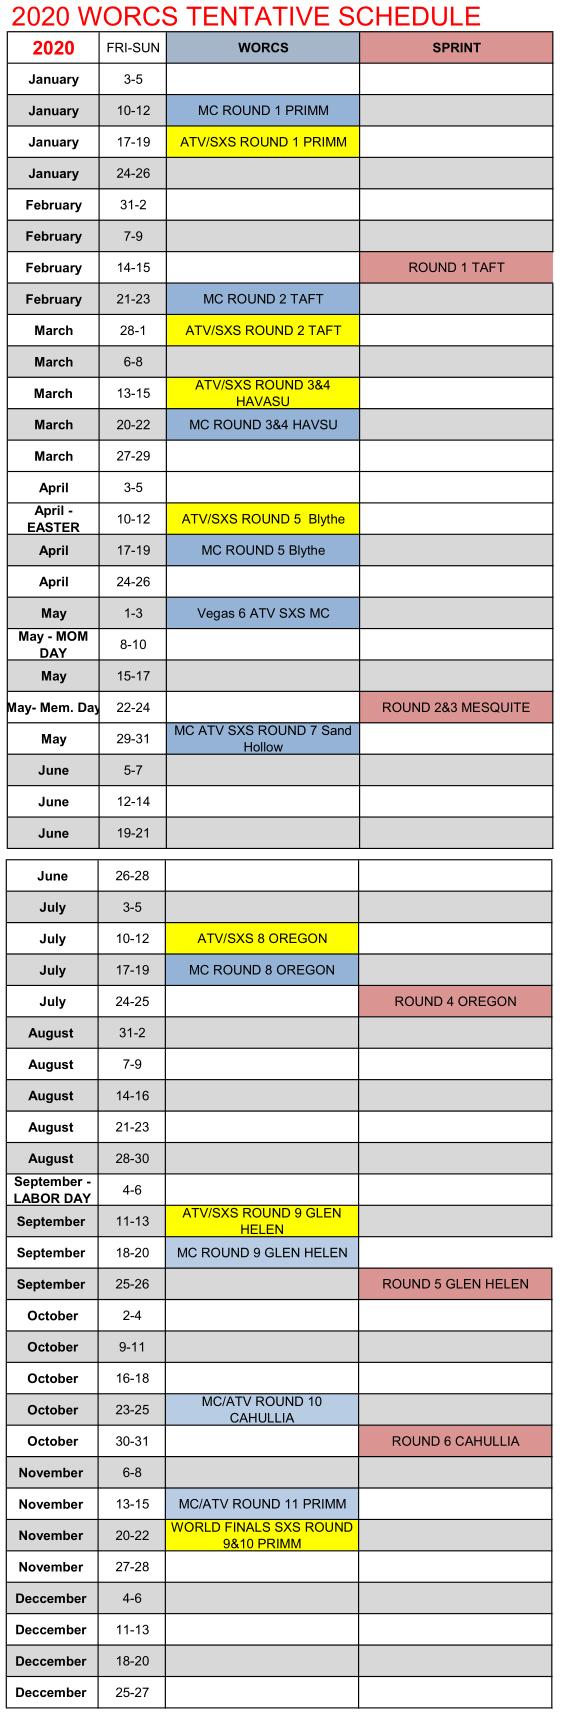 2020 WORCS TENTATIVE MASTER Schedule